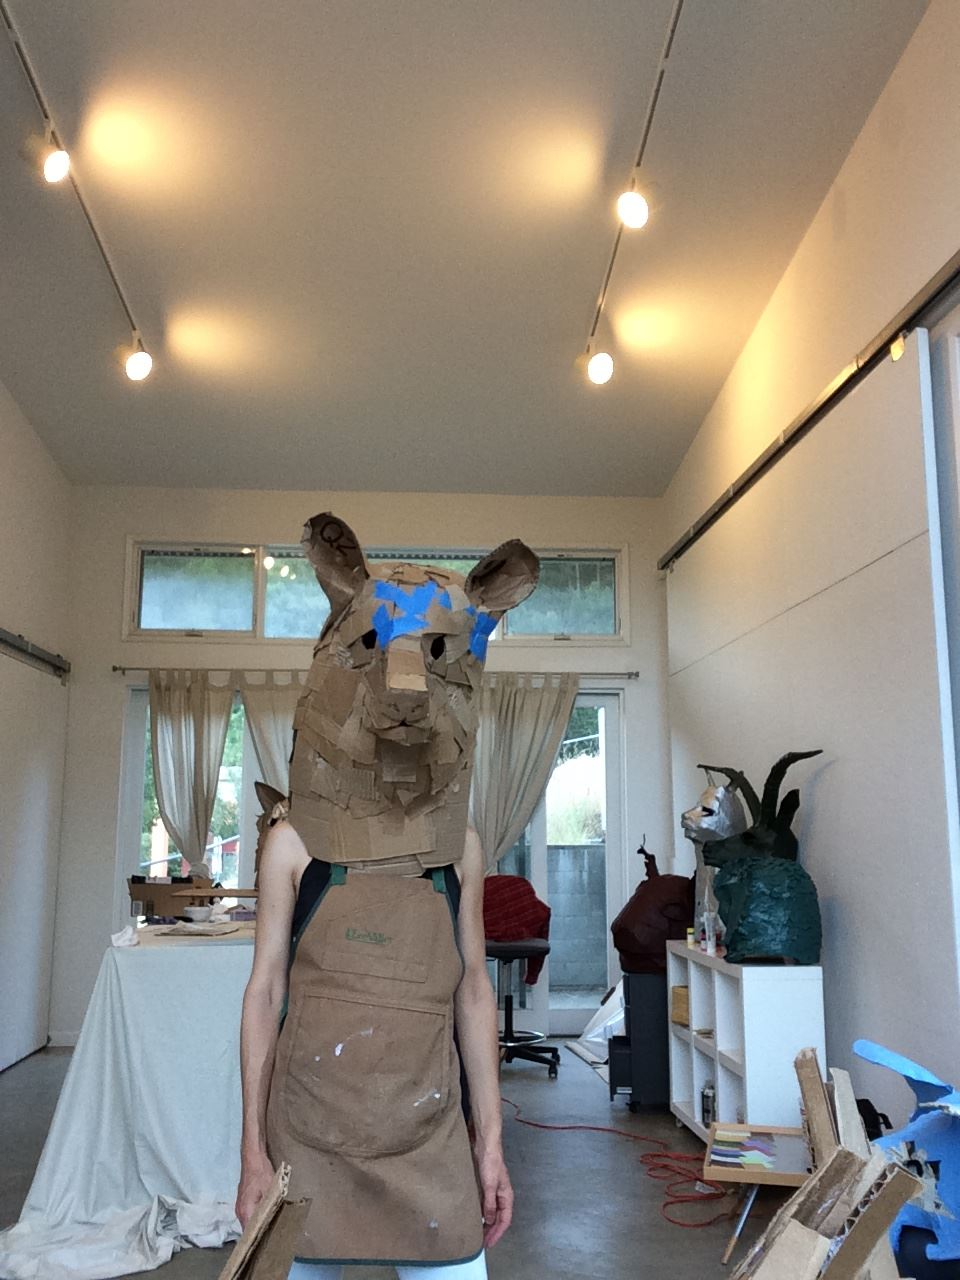 Bear head in process at the Montalvo Art Center, July 2016